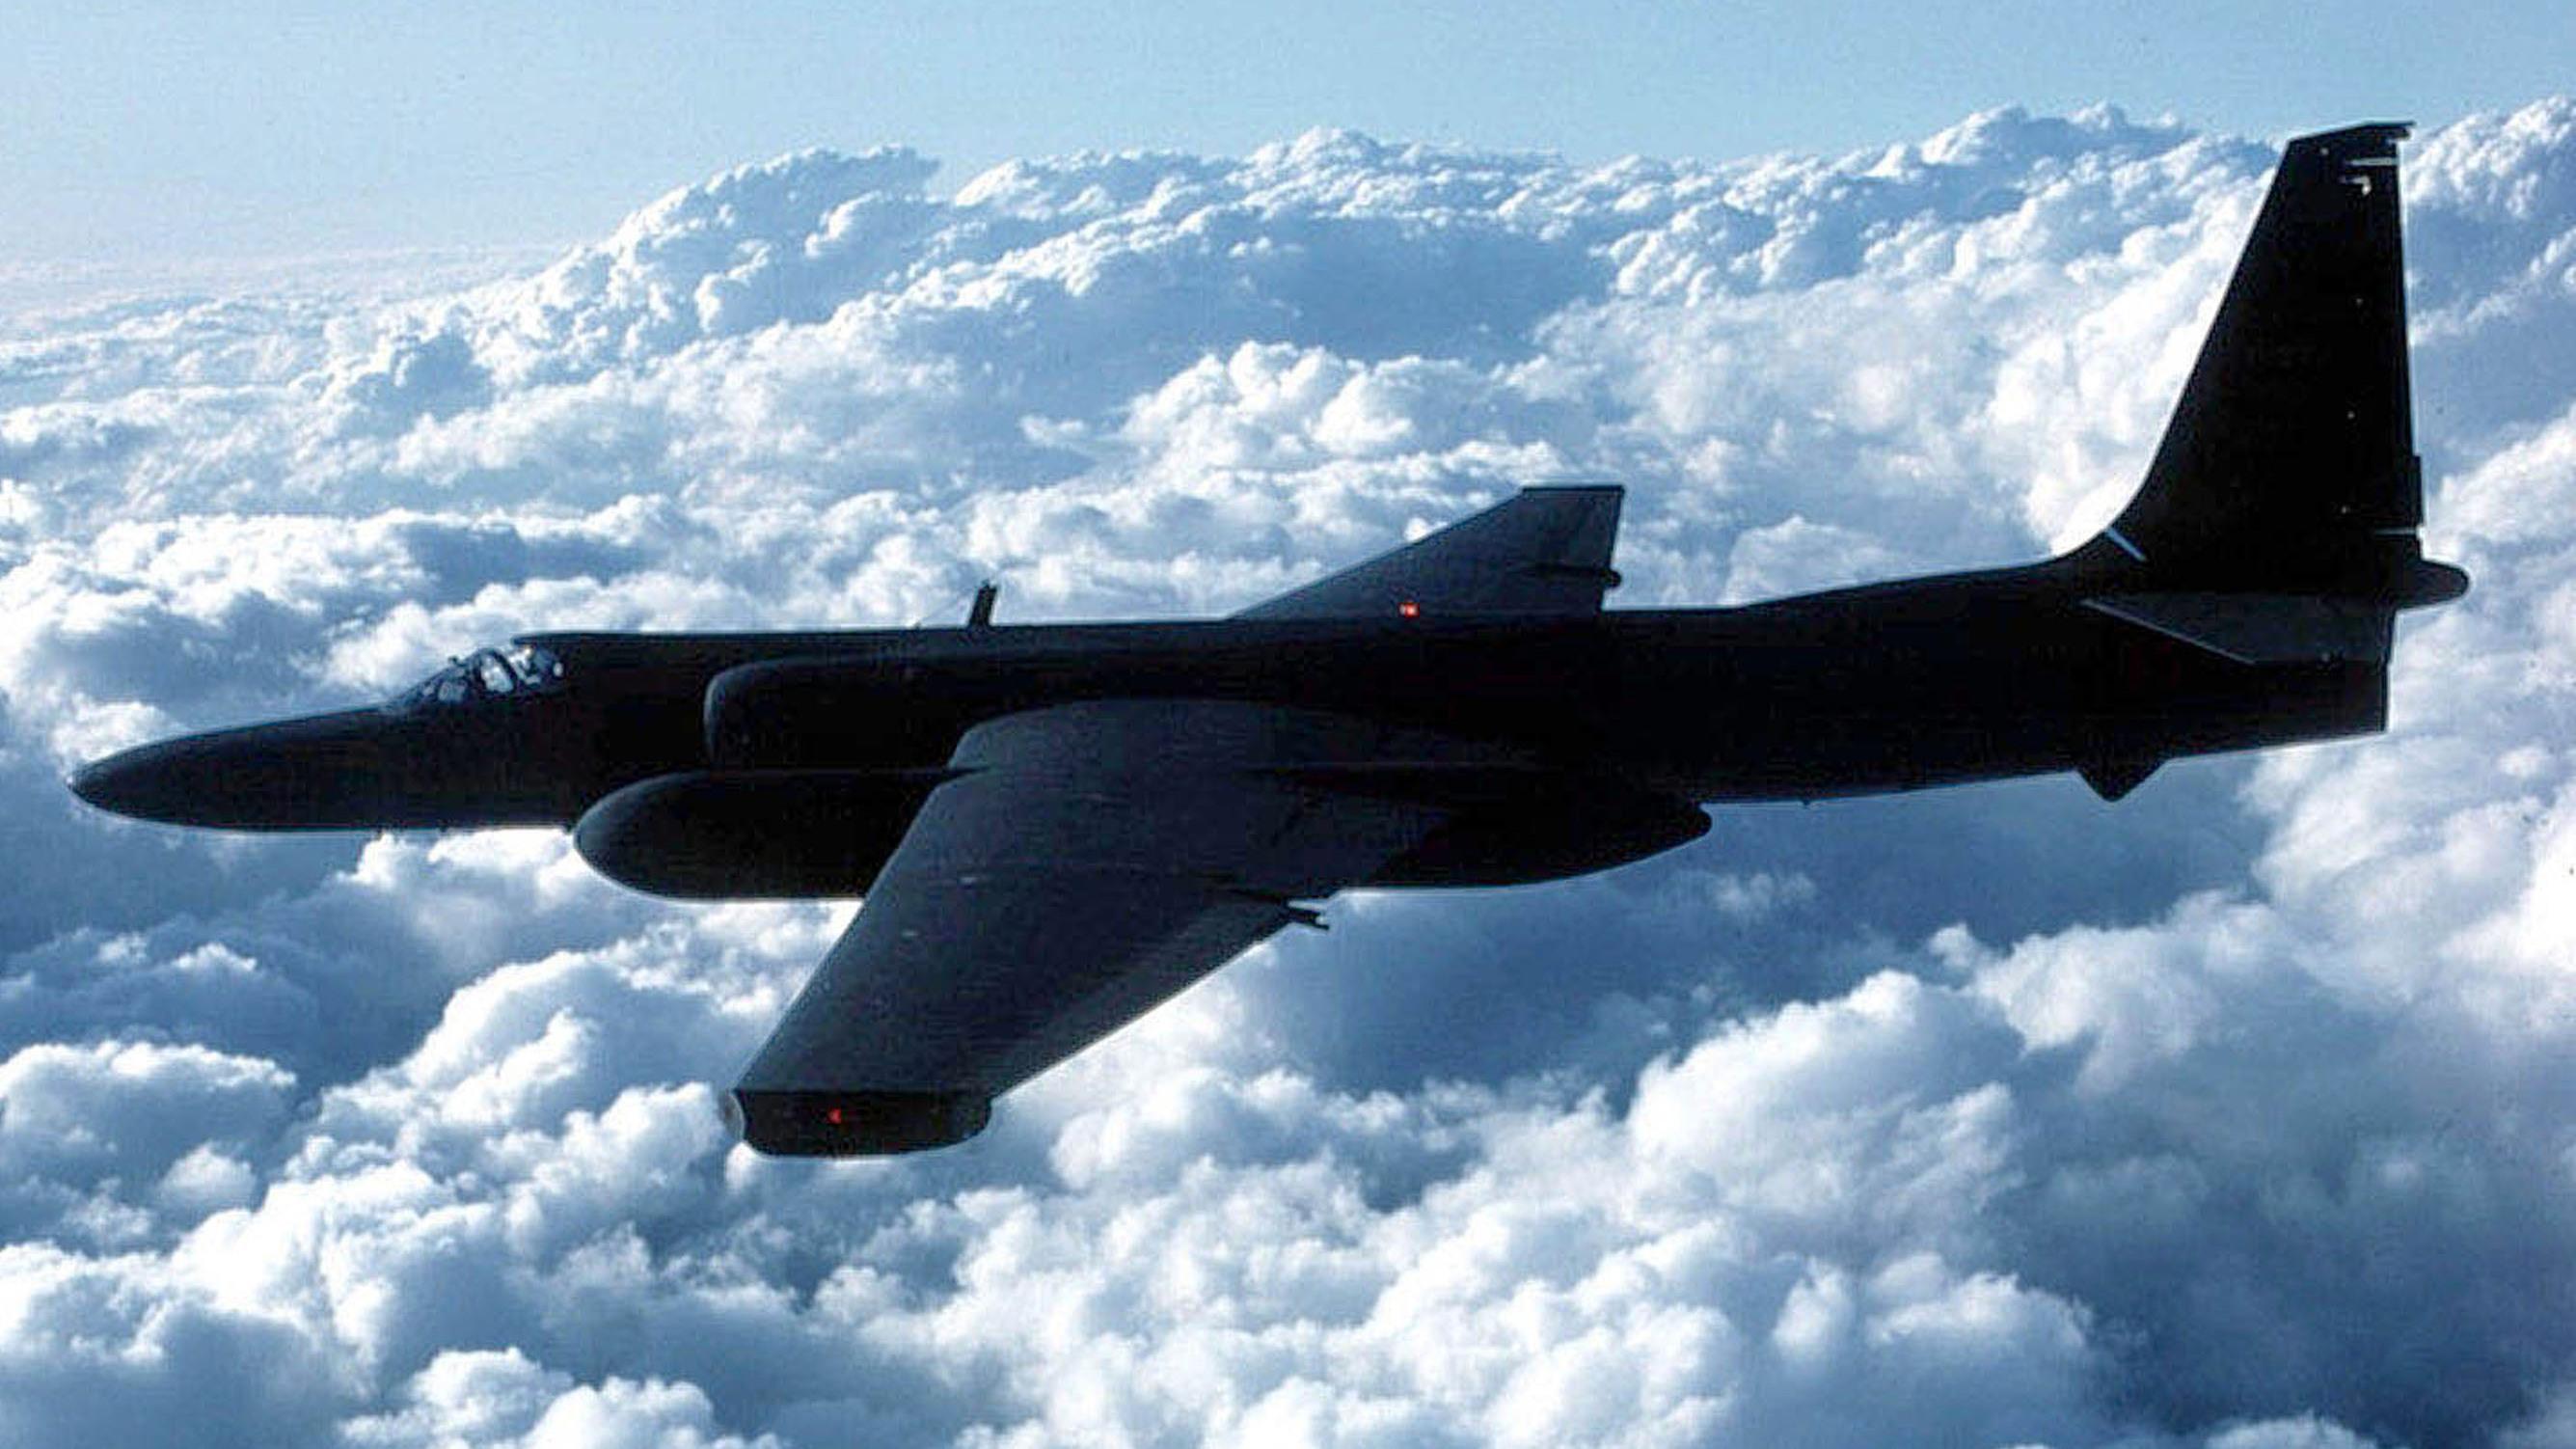 Mengenal 39 Jenis Pesawat Angkatan Udara AS